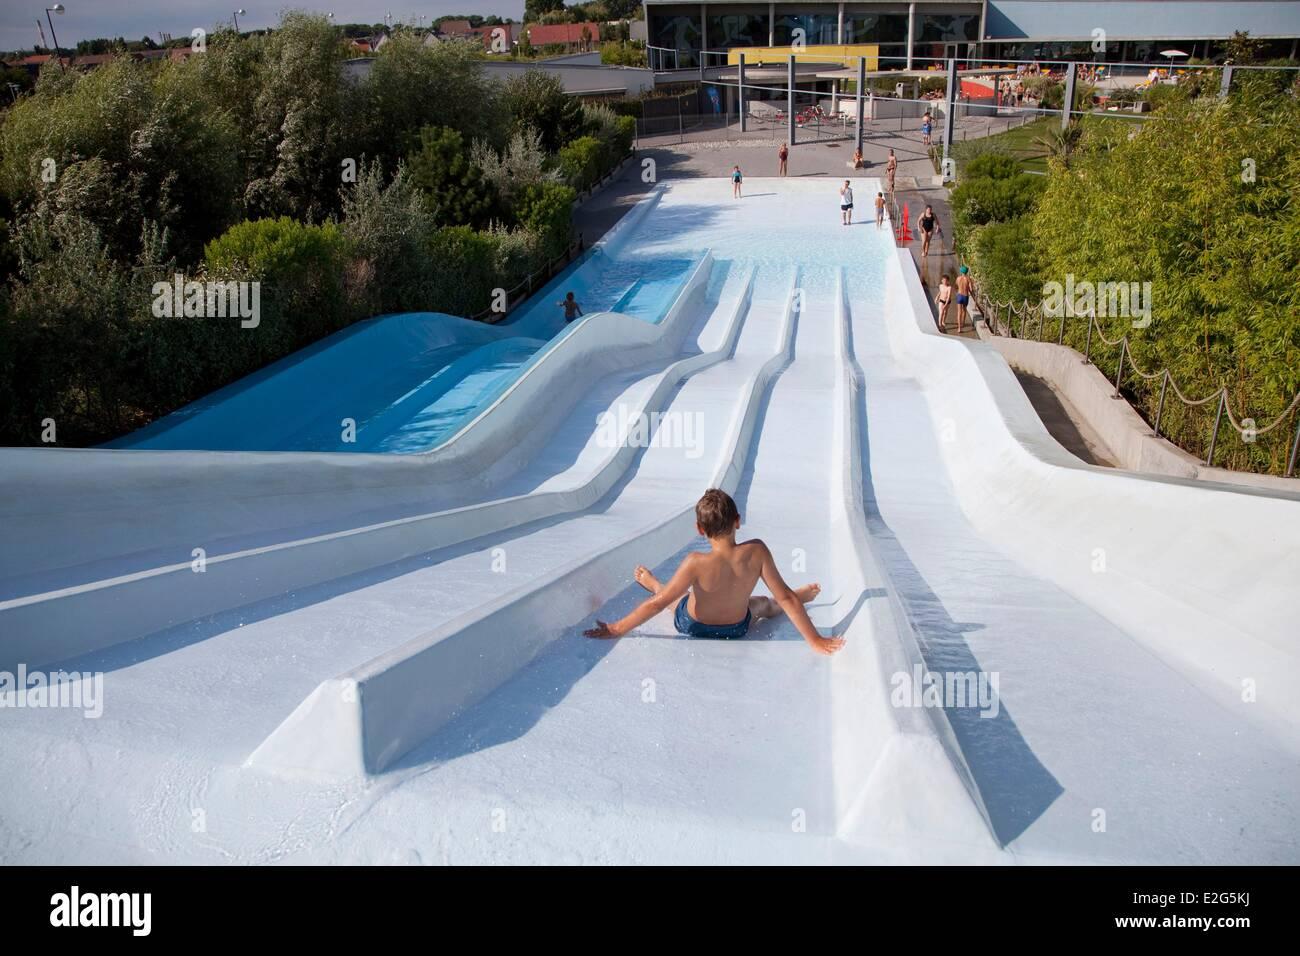 Captivating France Pas De Calais Calais Child Sliding Down A Slide At The Pool ICEO    Stock